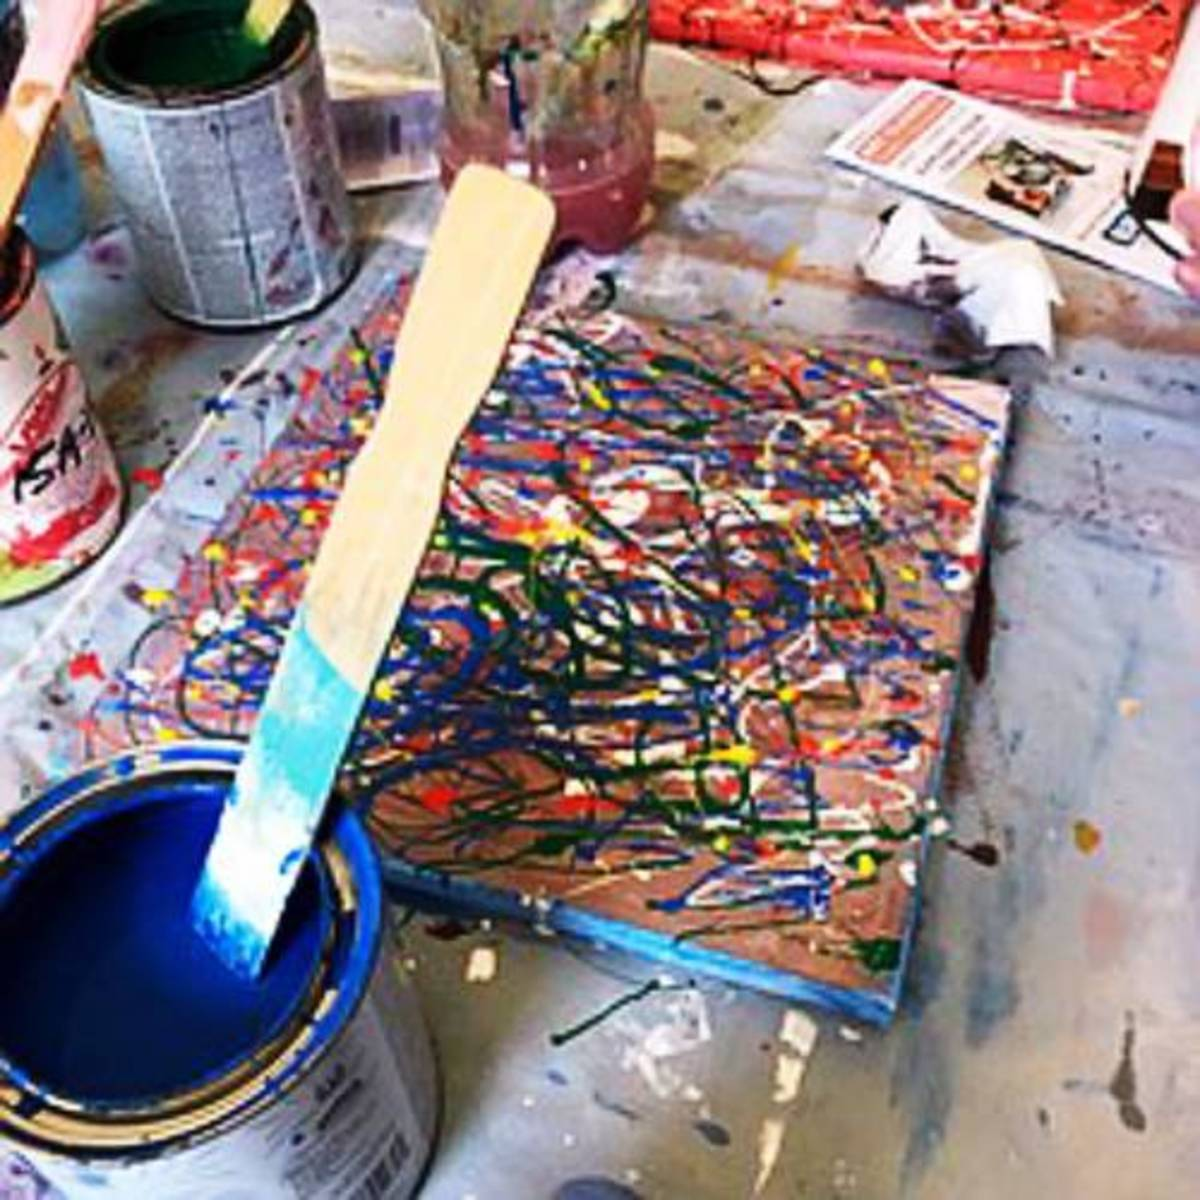 Find your Jackson Pollock inner artist!